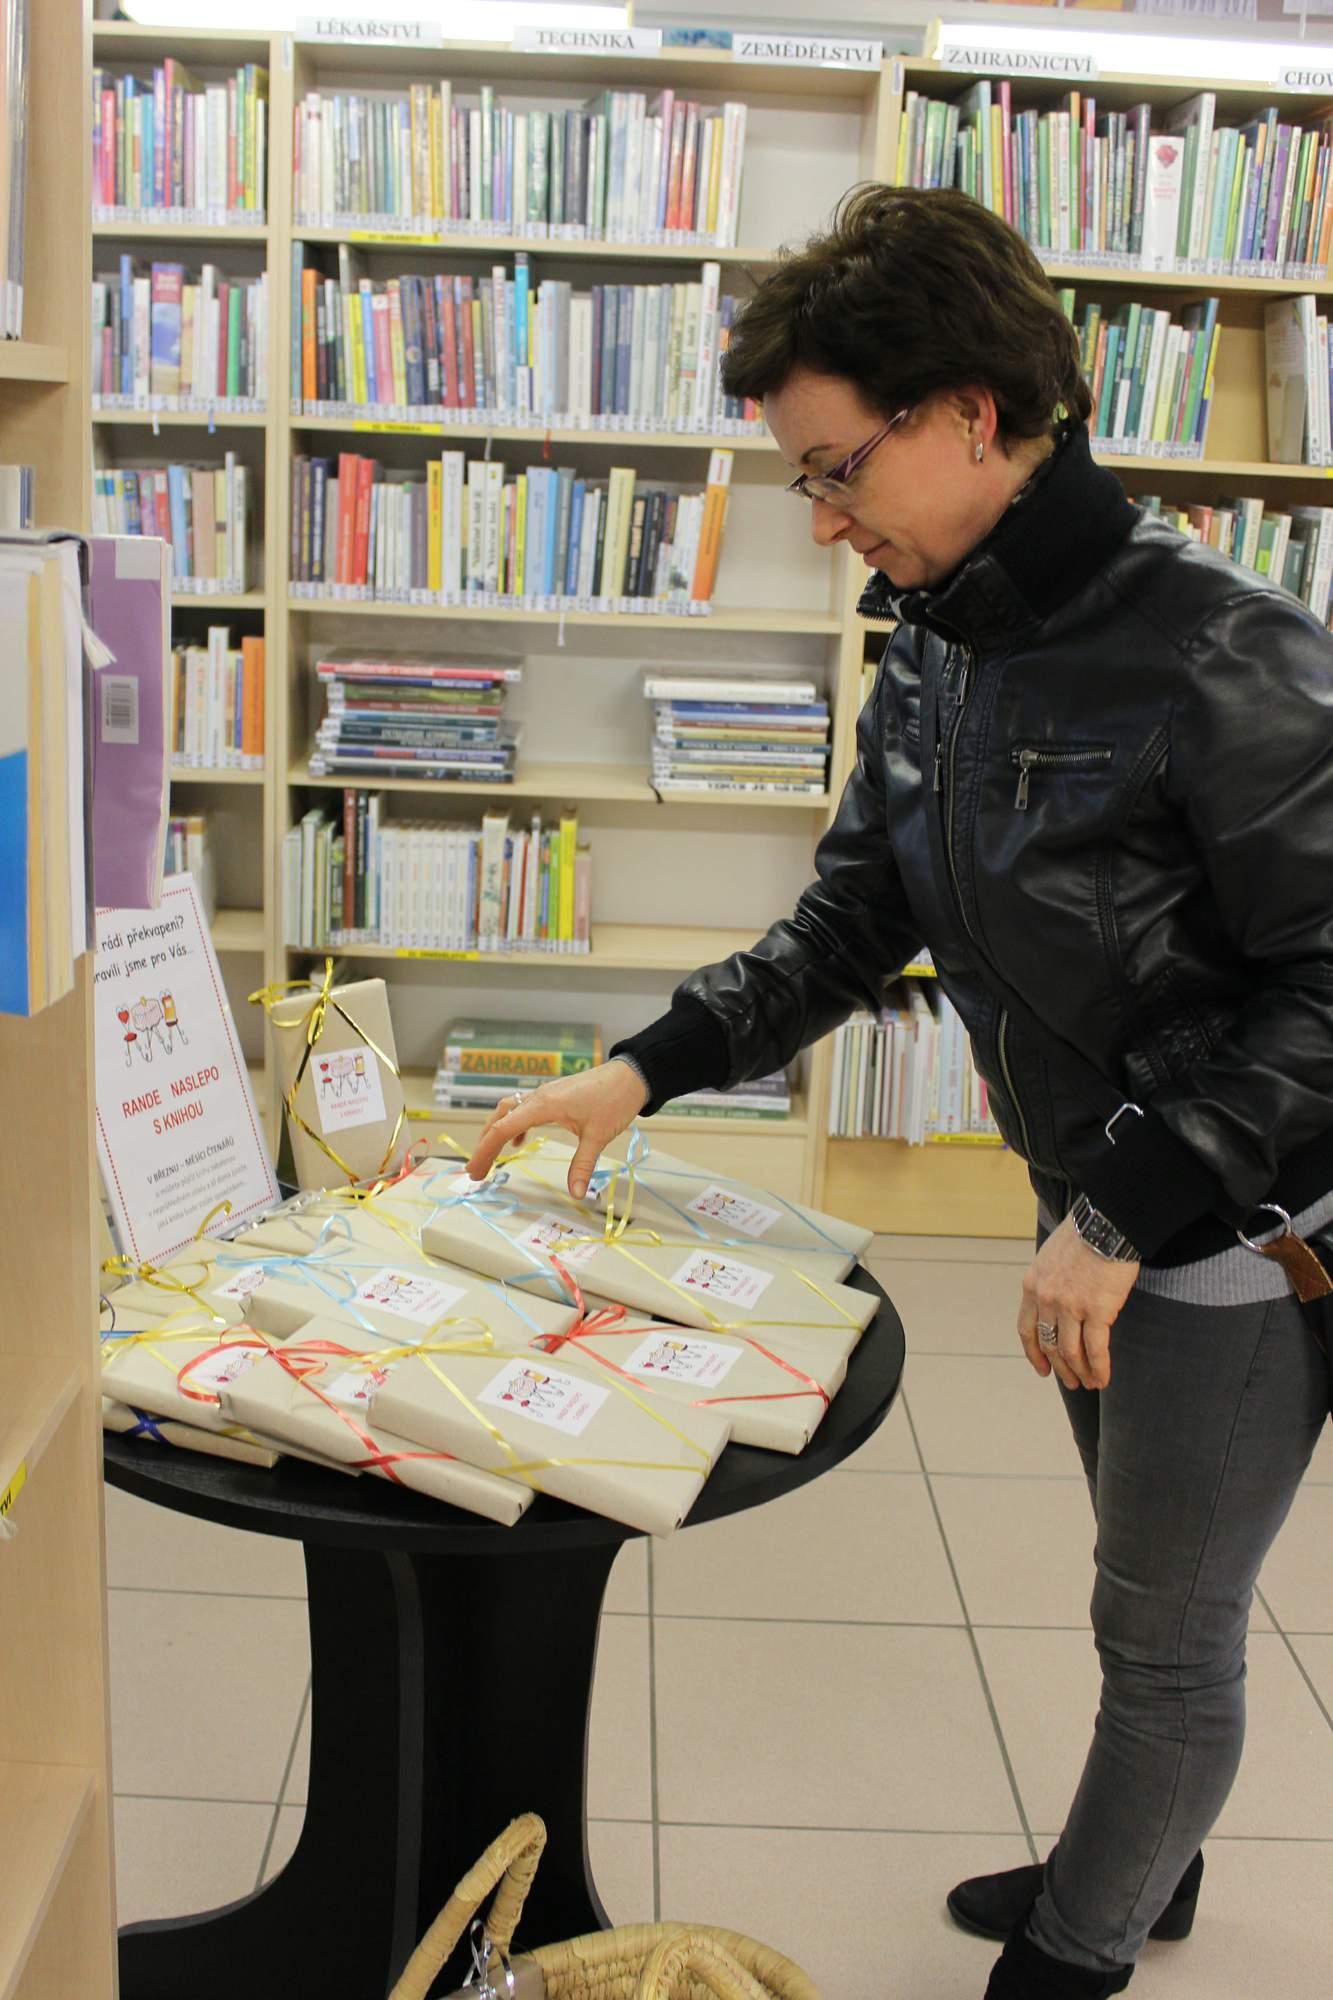 Bystice pod Hostnem, Rande naslepo s knihou, bezn 2017